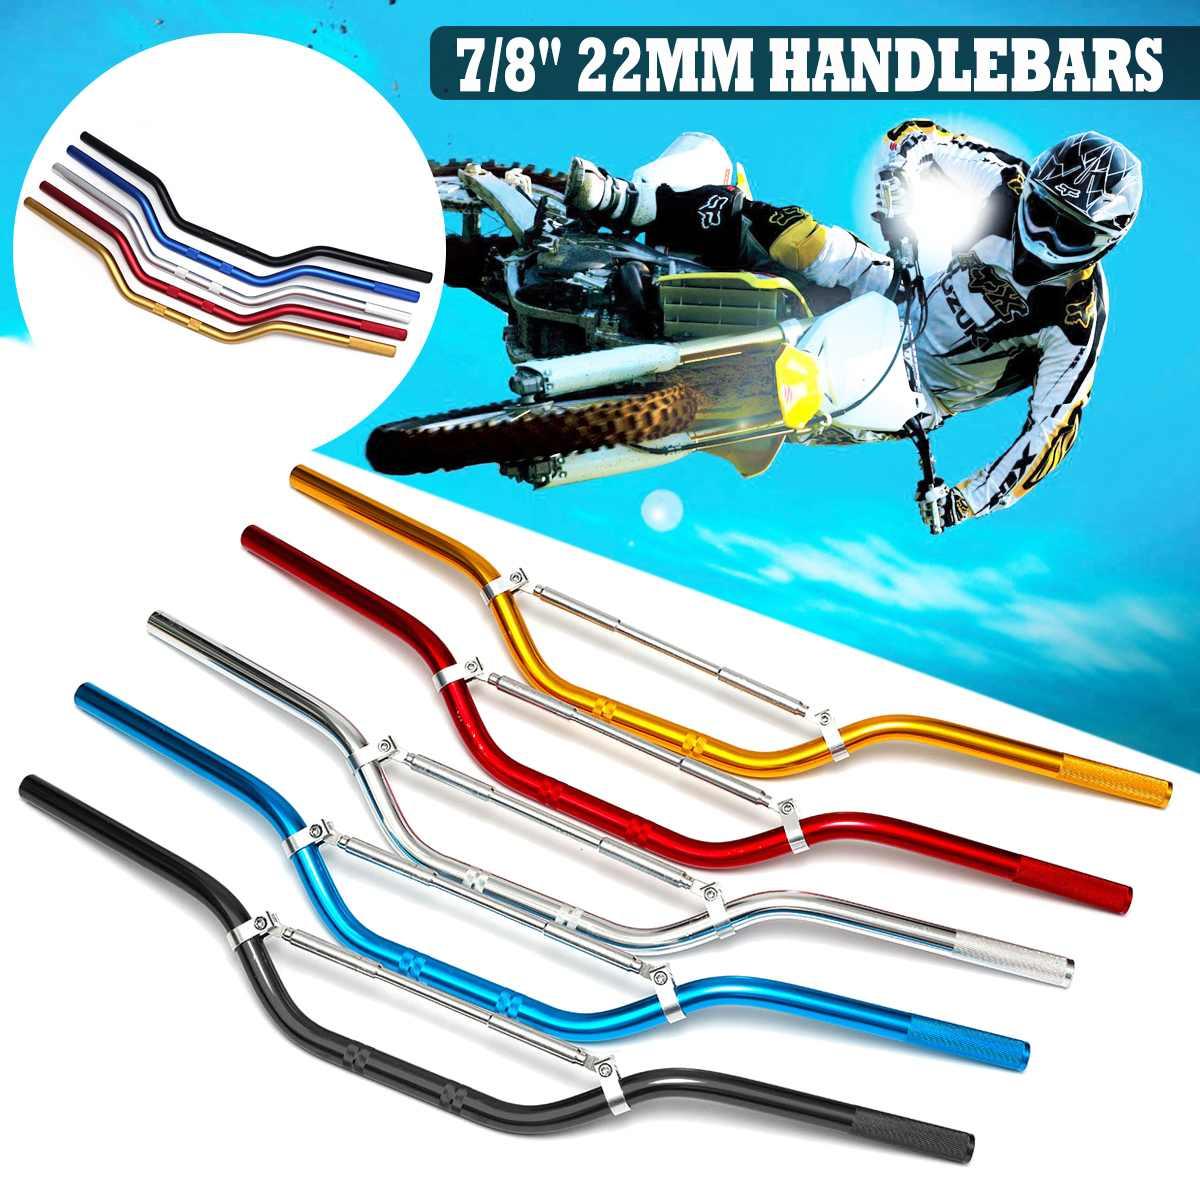 22mm Universal Motorcycle Handlebar Motor Motorbike Aluminum Alloy Handlebars Moto Scooter Retro Black Anti-rust Handle Bars